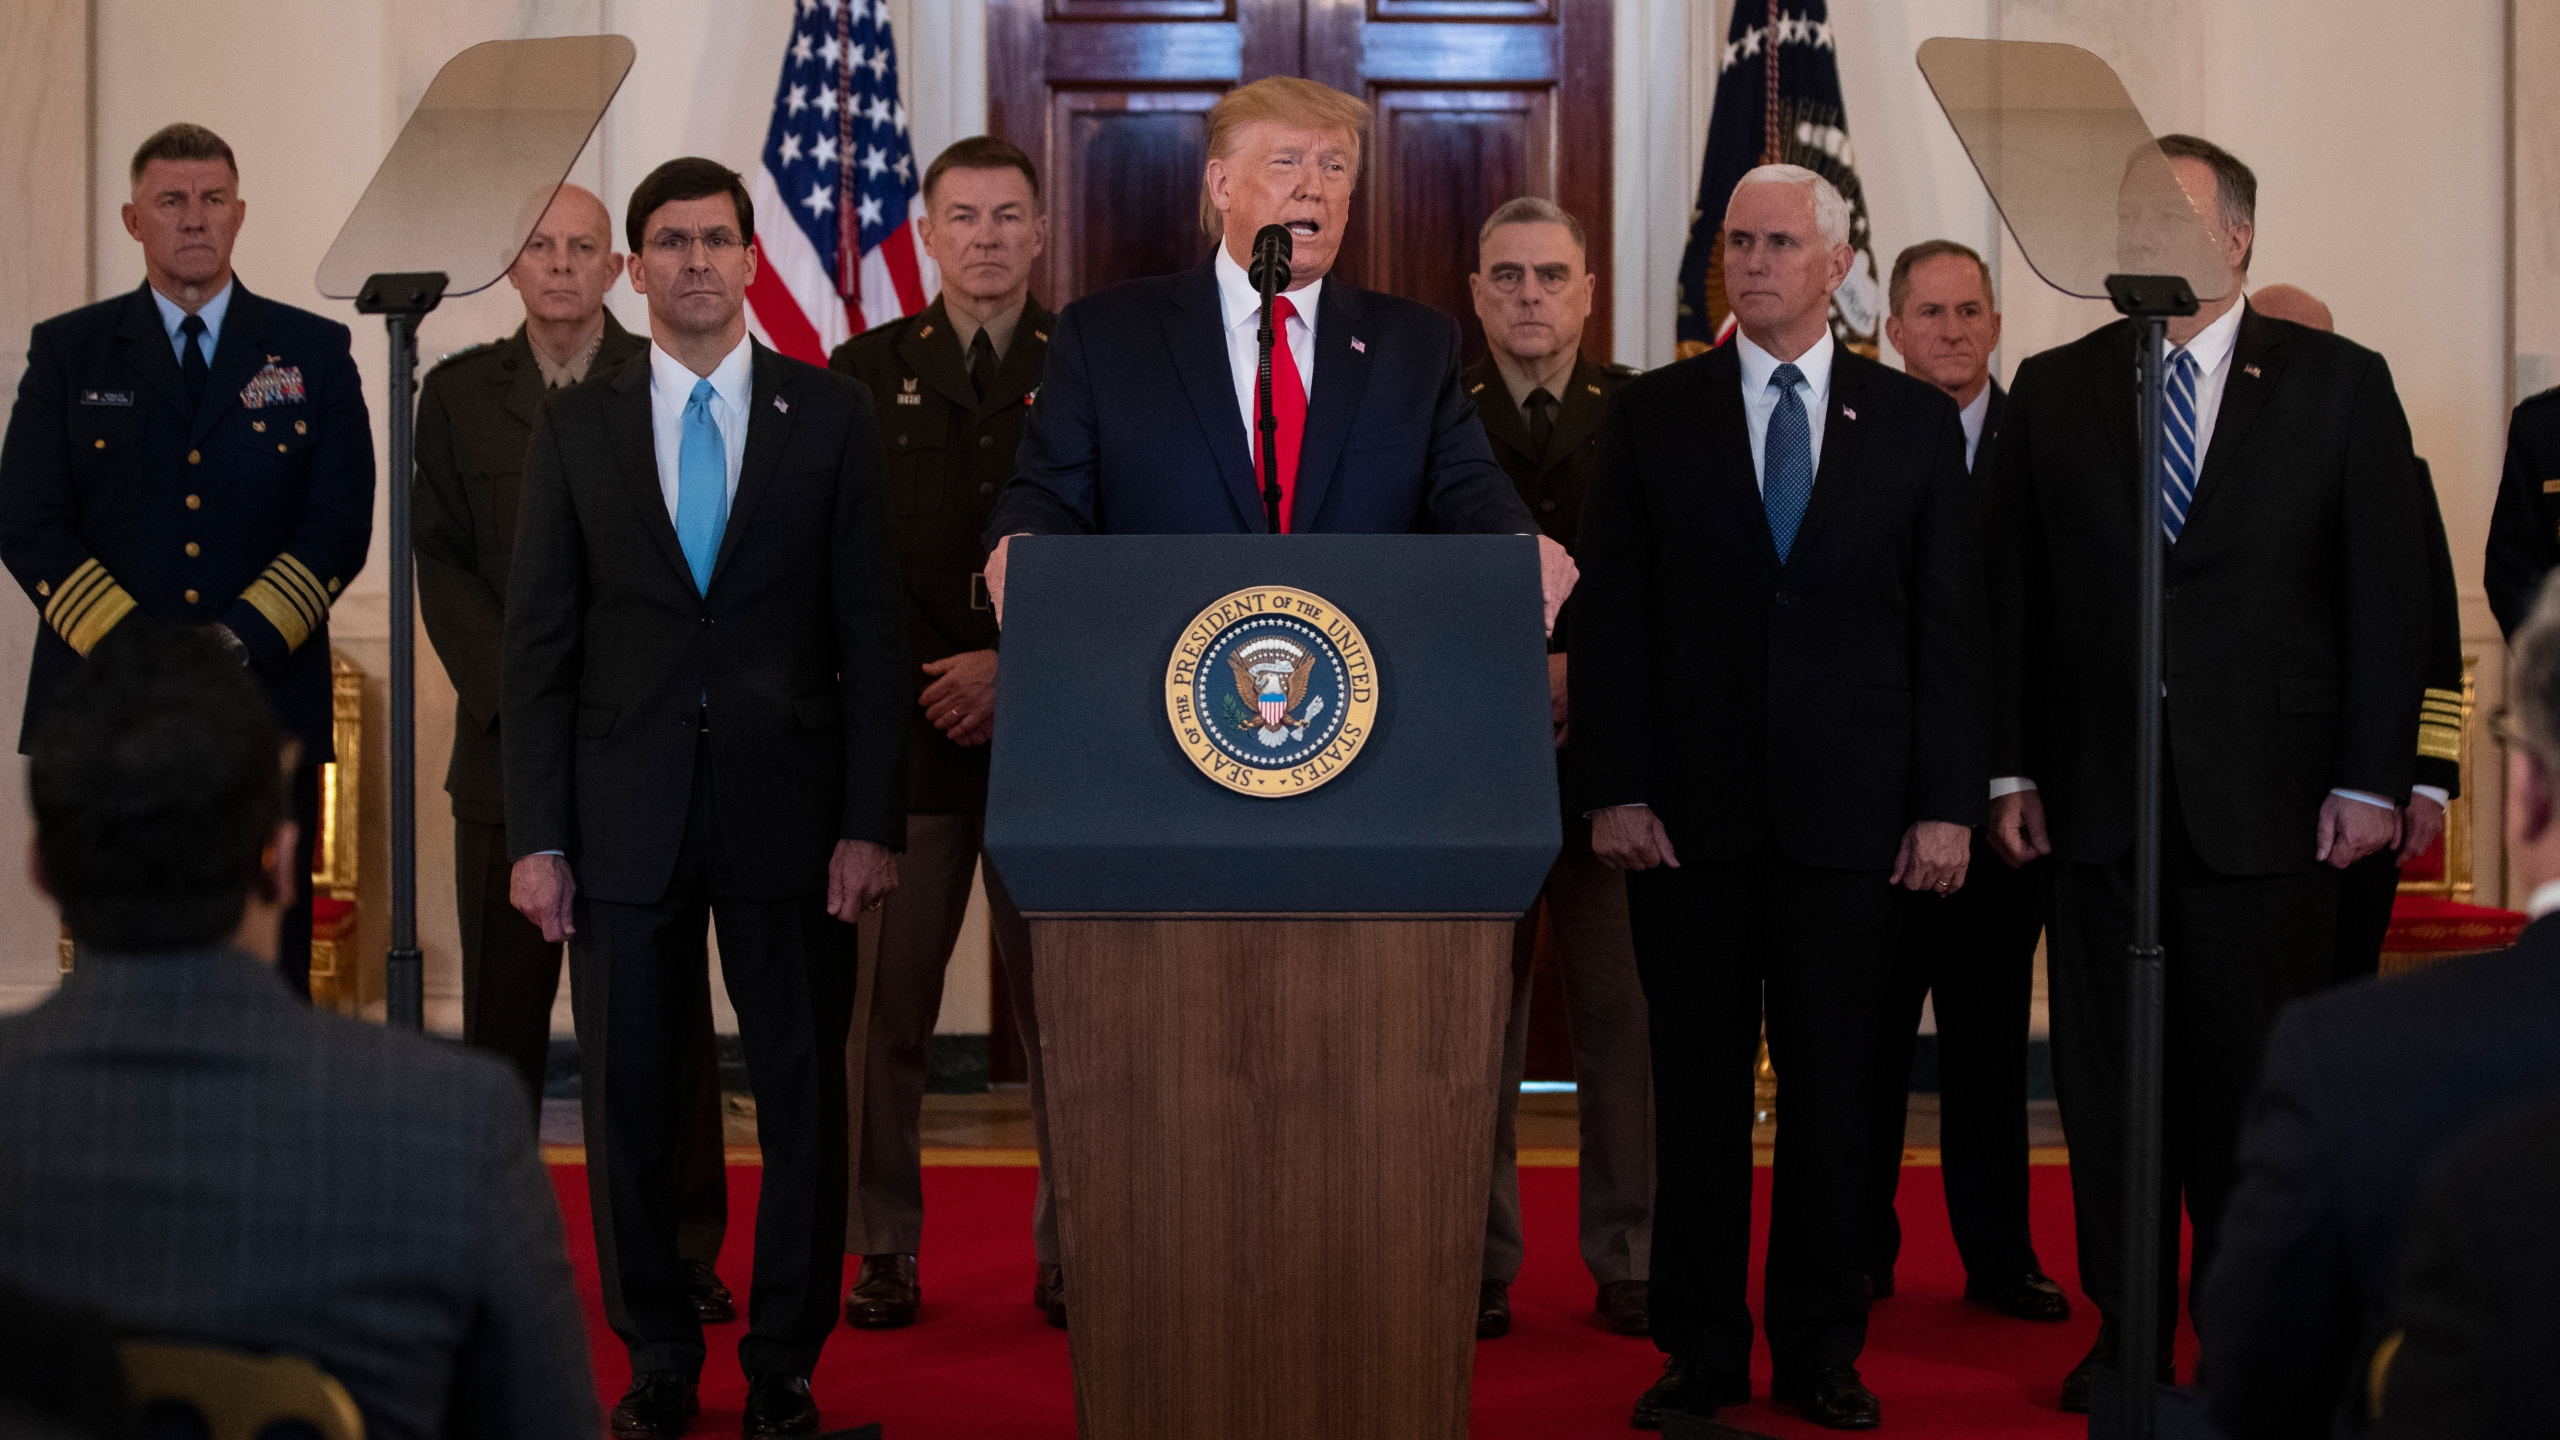 Donald Trump, Mark Esper, Mark Milley, Mike Pompeo